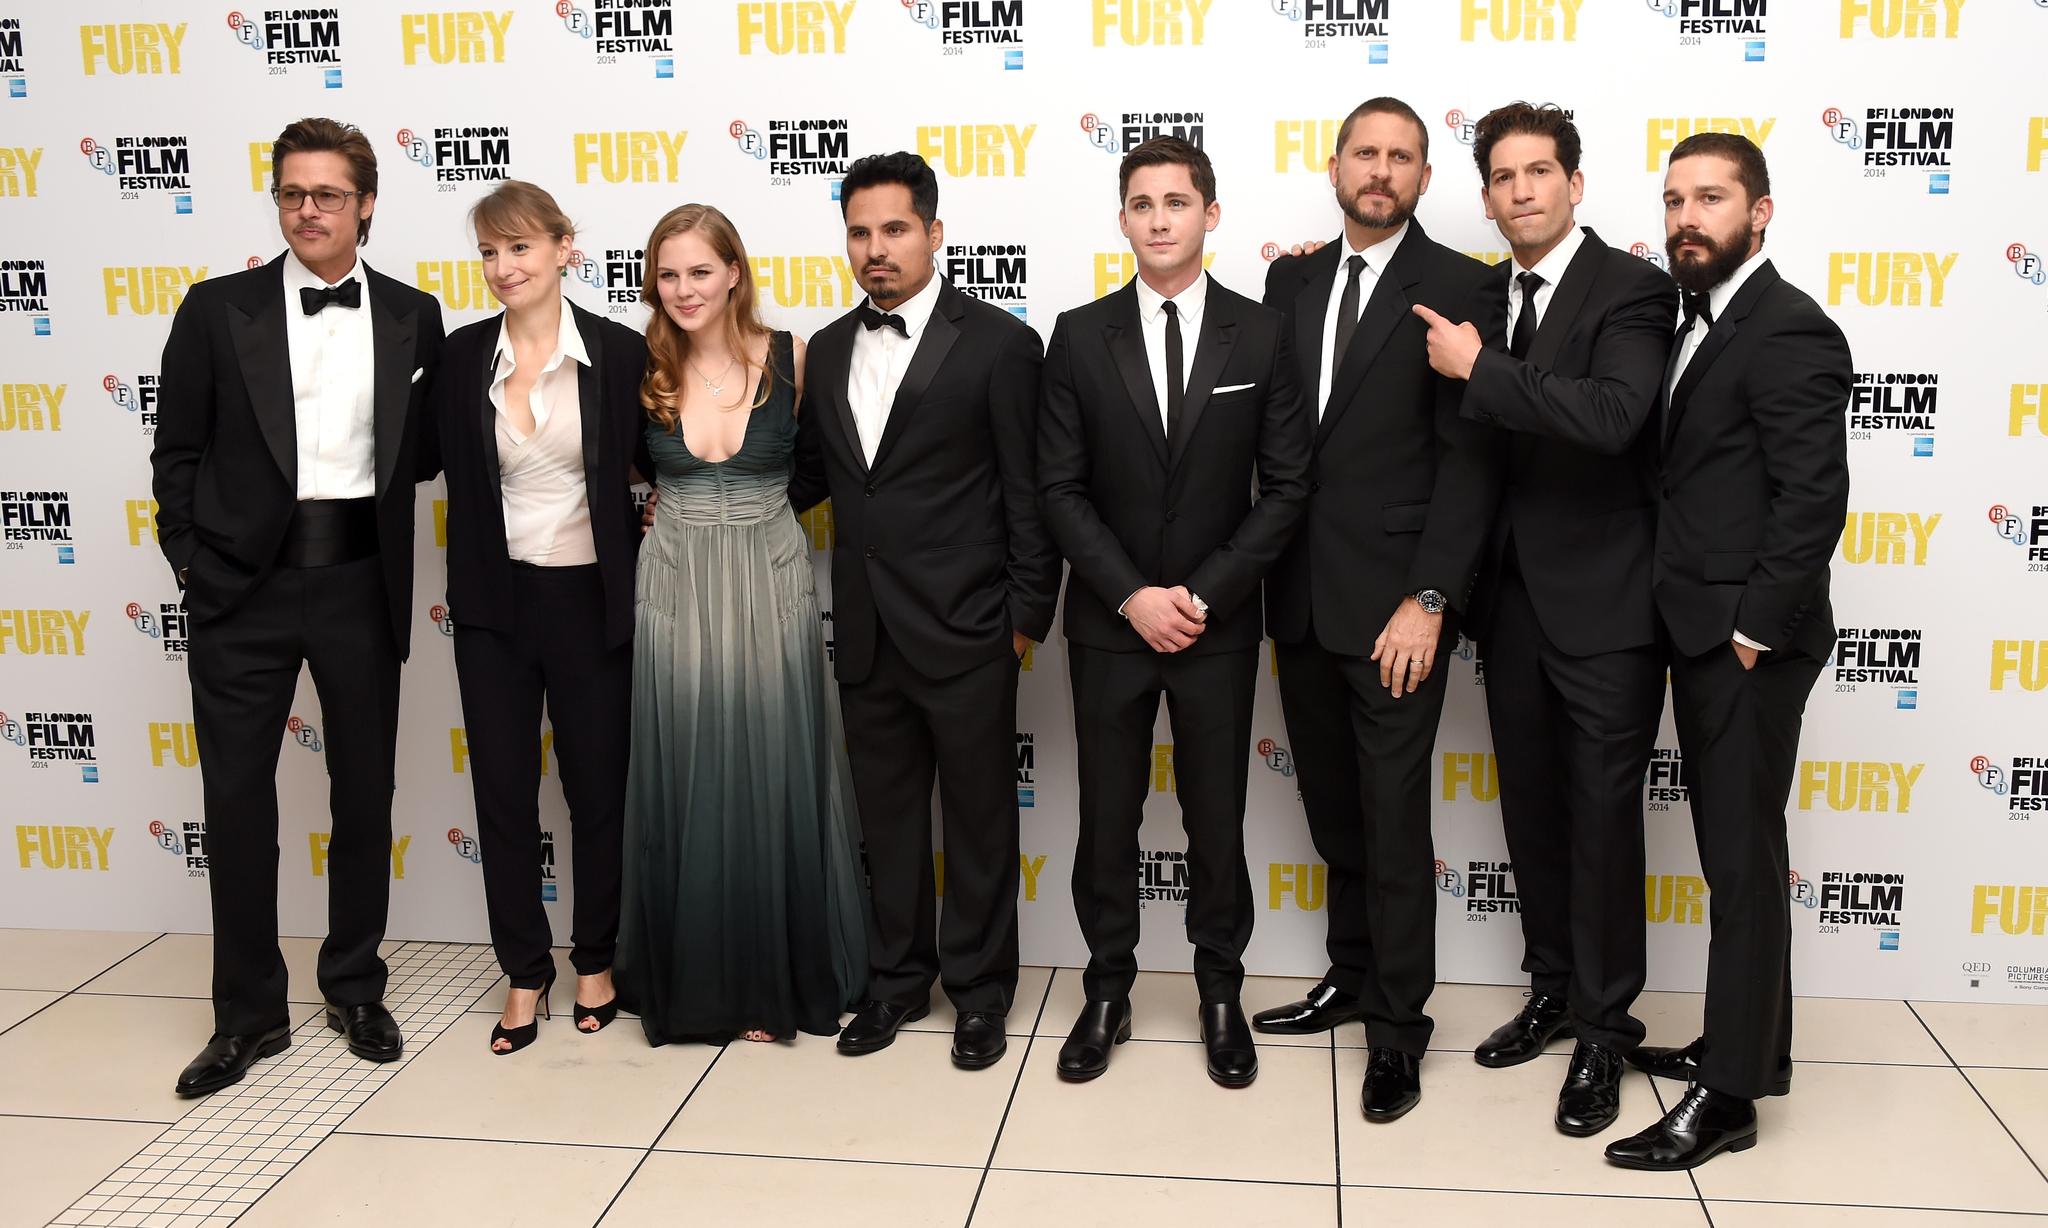 Brad Pitt, David Ayer, Logan Lerman, Jon Bernthal, Anamaria Marinca and Alicia von Rittberg at event of Inirsis (2014)